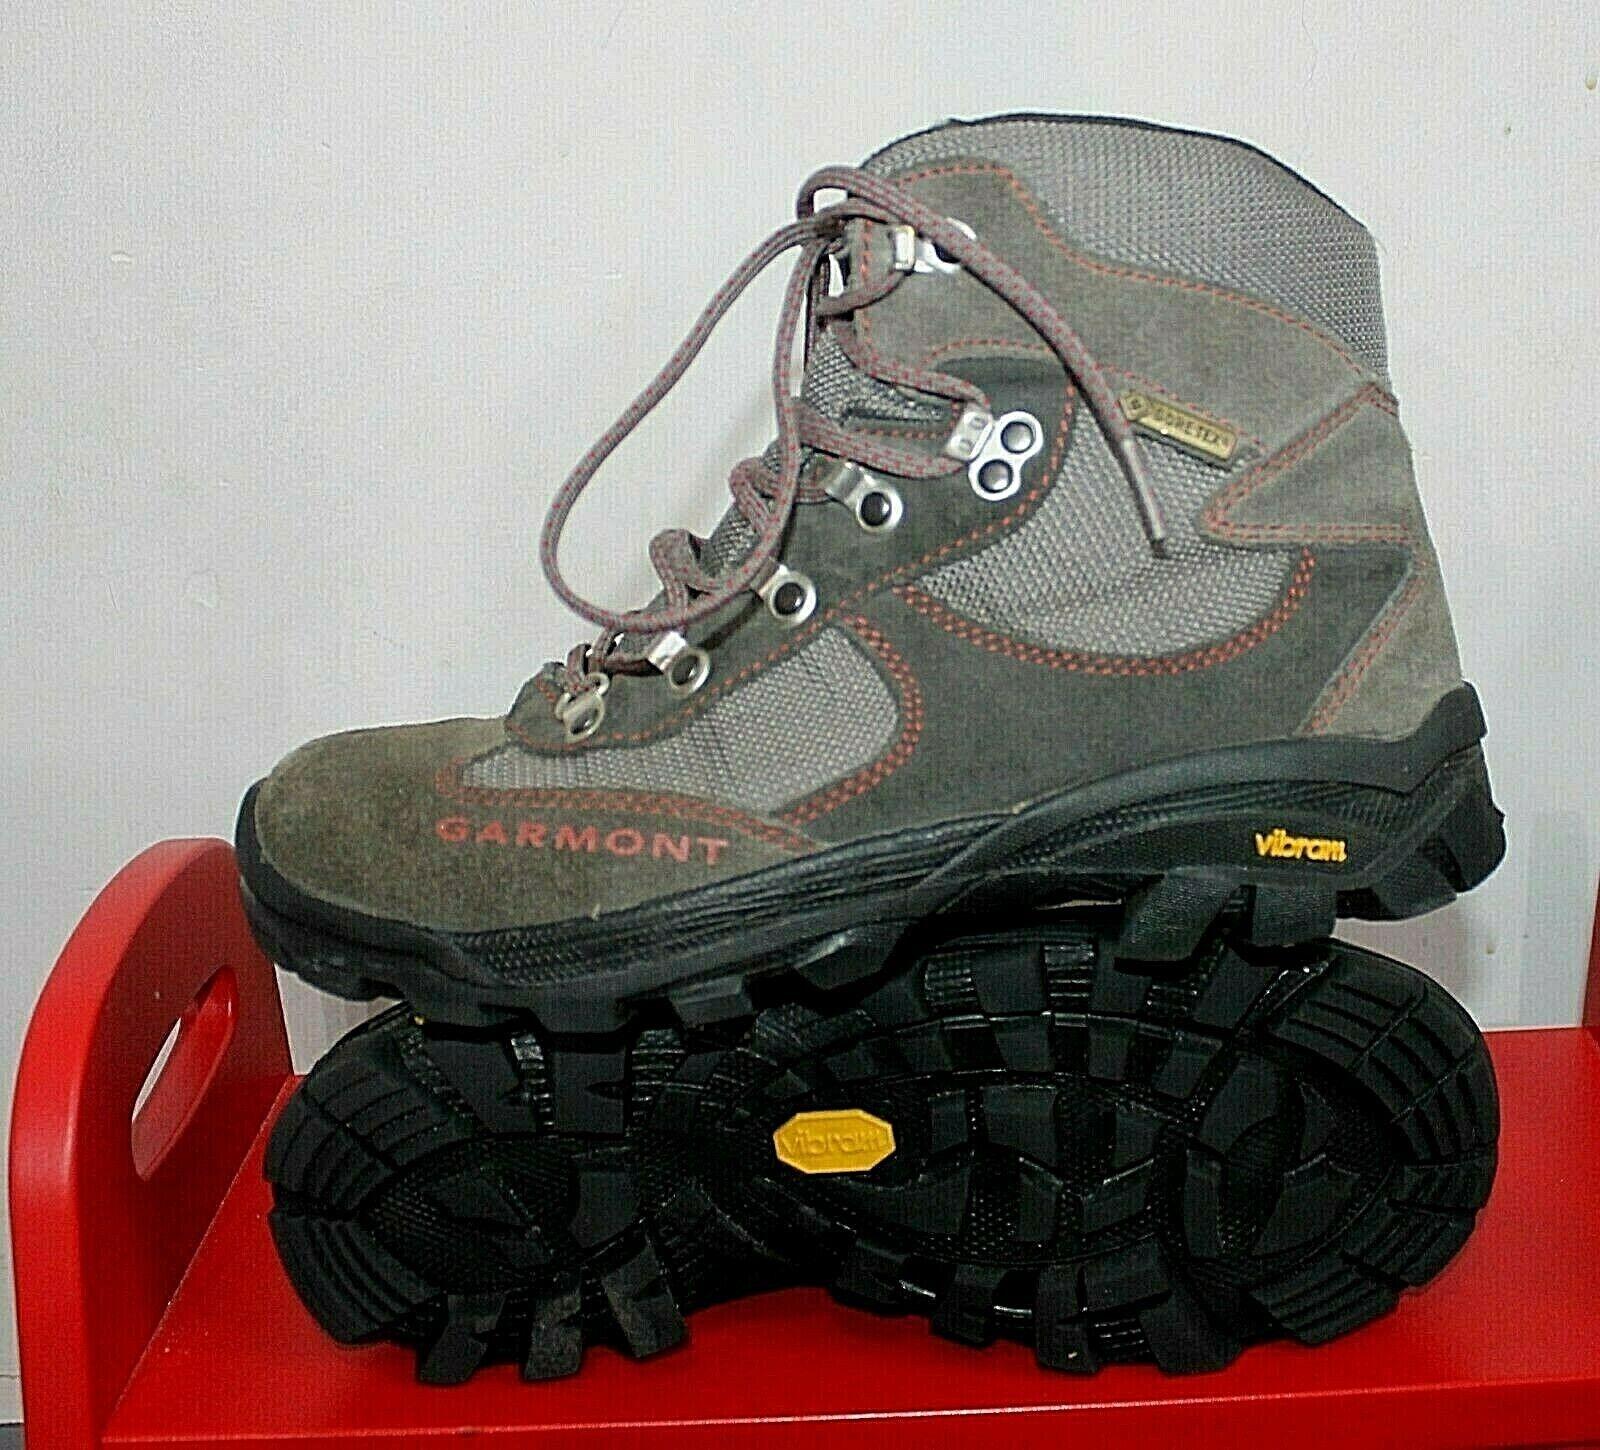 GARMONT GORETEX Montaña Caminar Senderismo botas Para Hombre De Cuero gris US6